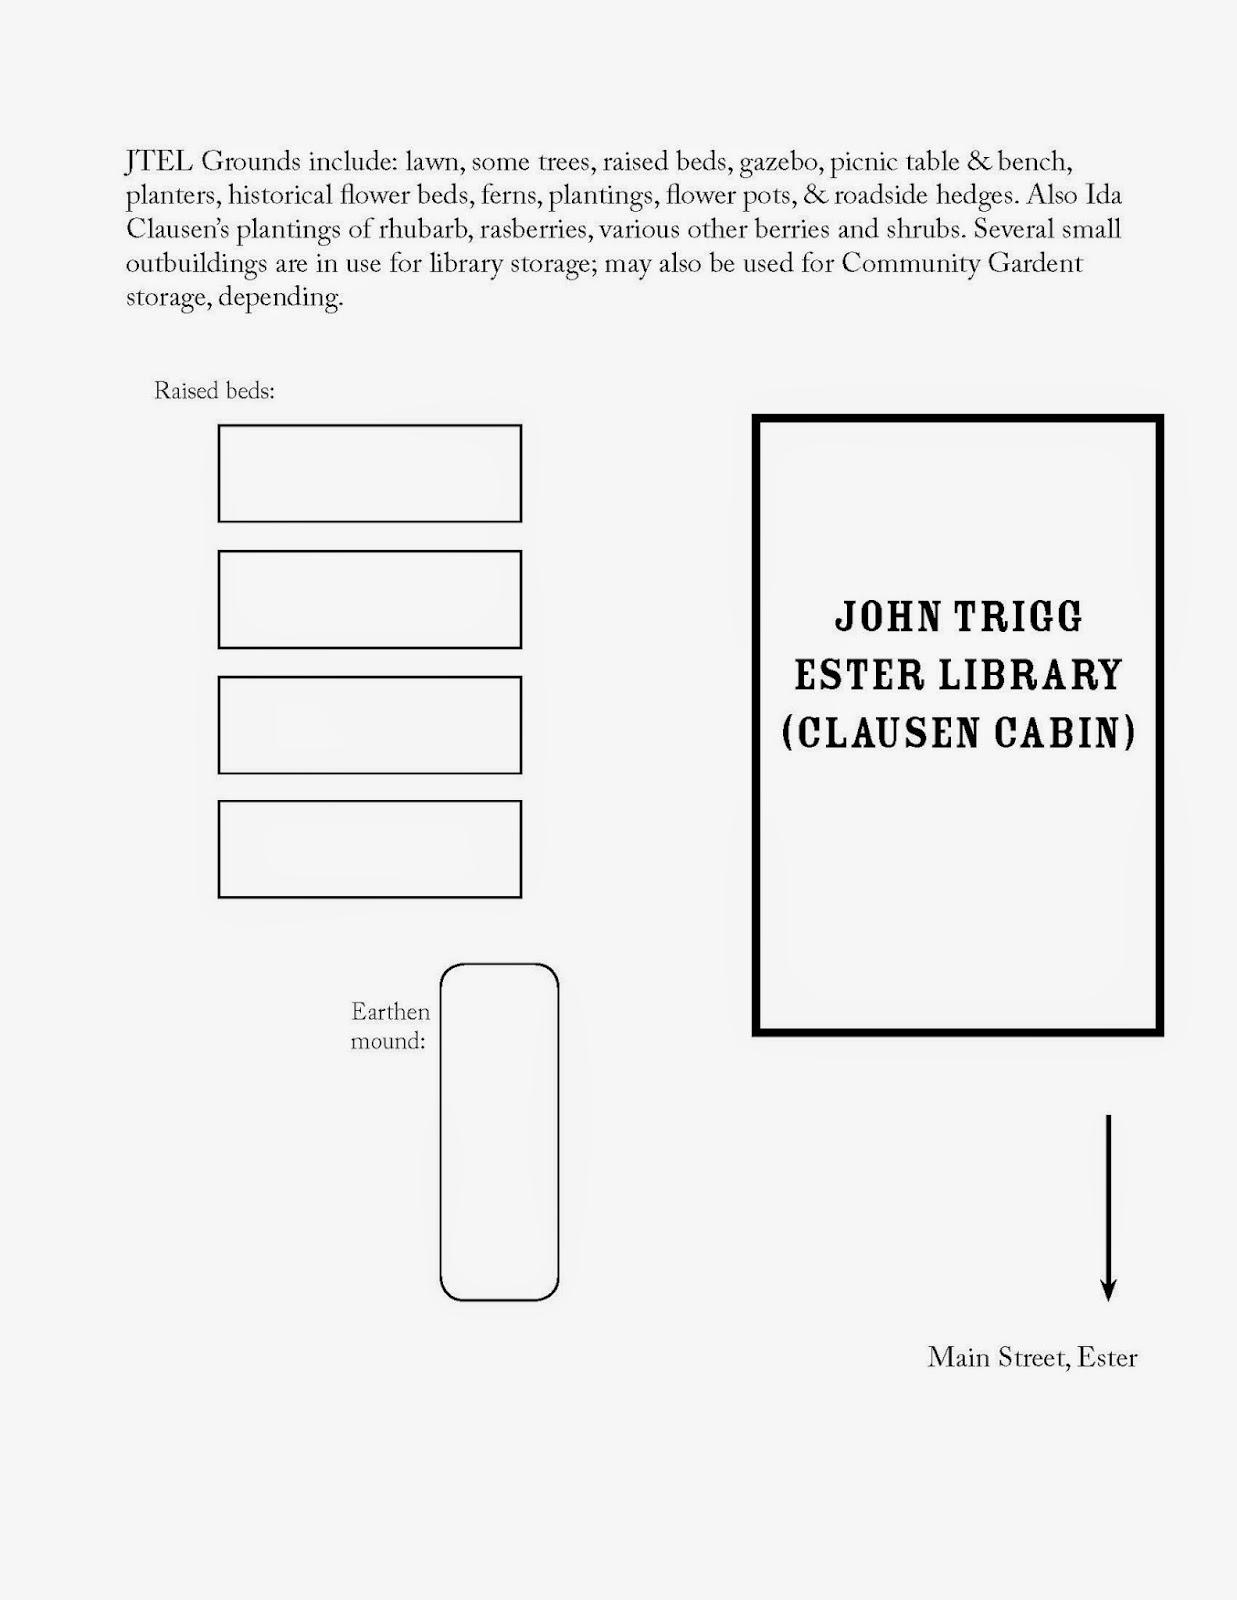 medium resolution of diagram showing major garden beds around the clausen cabin